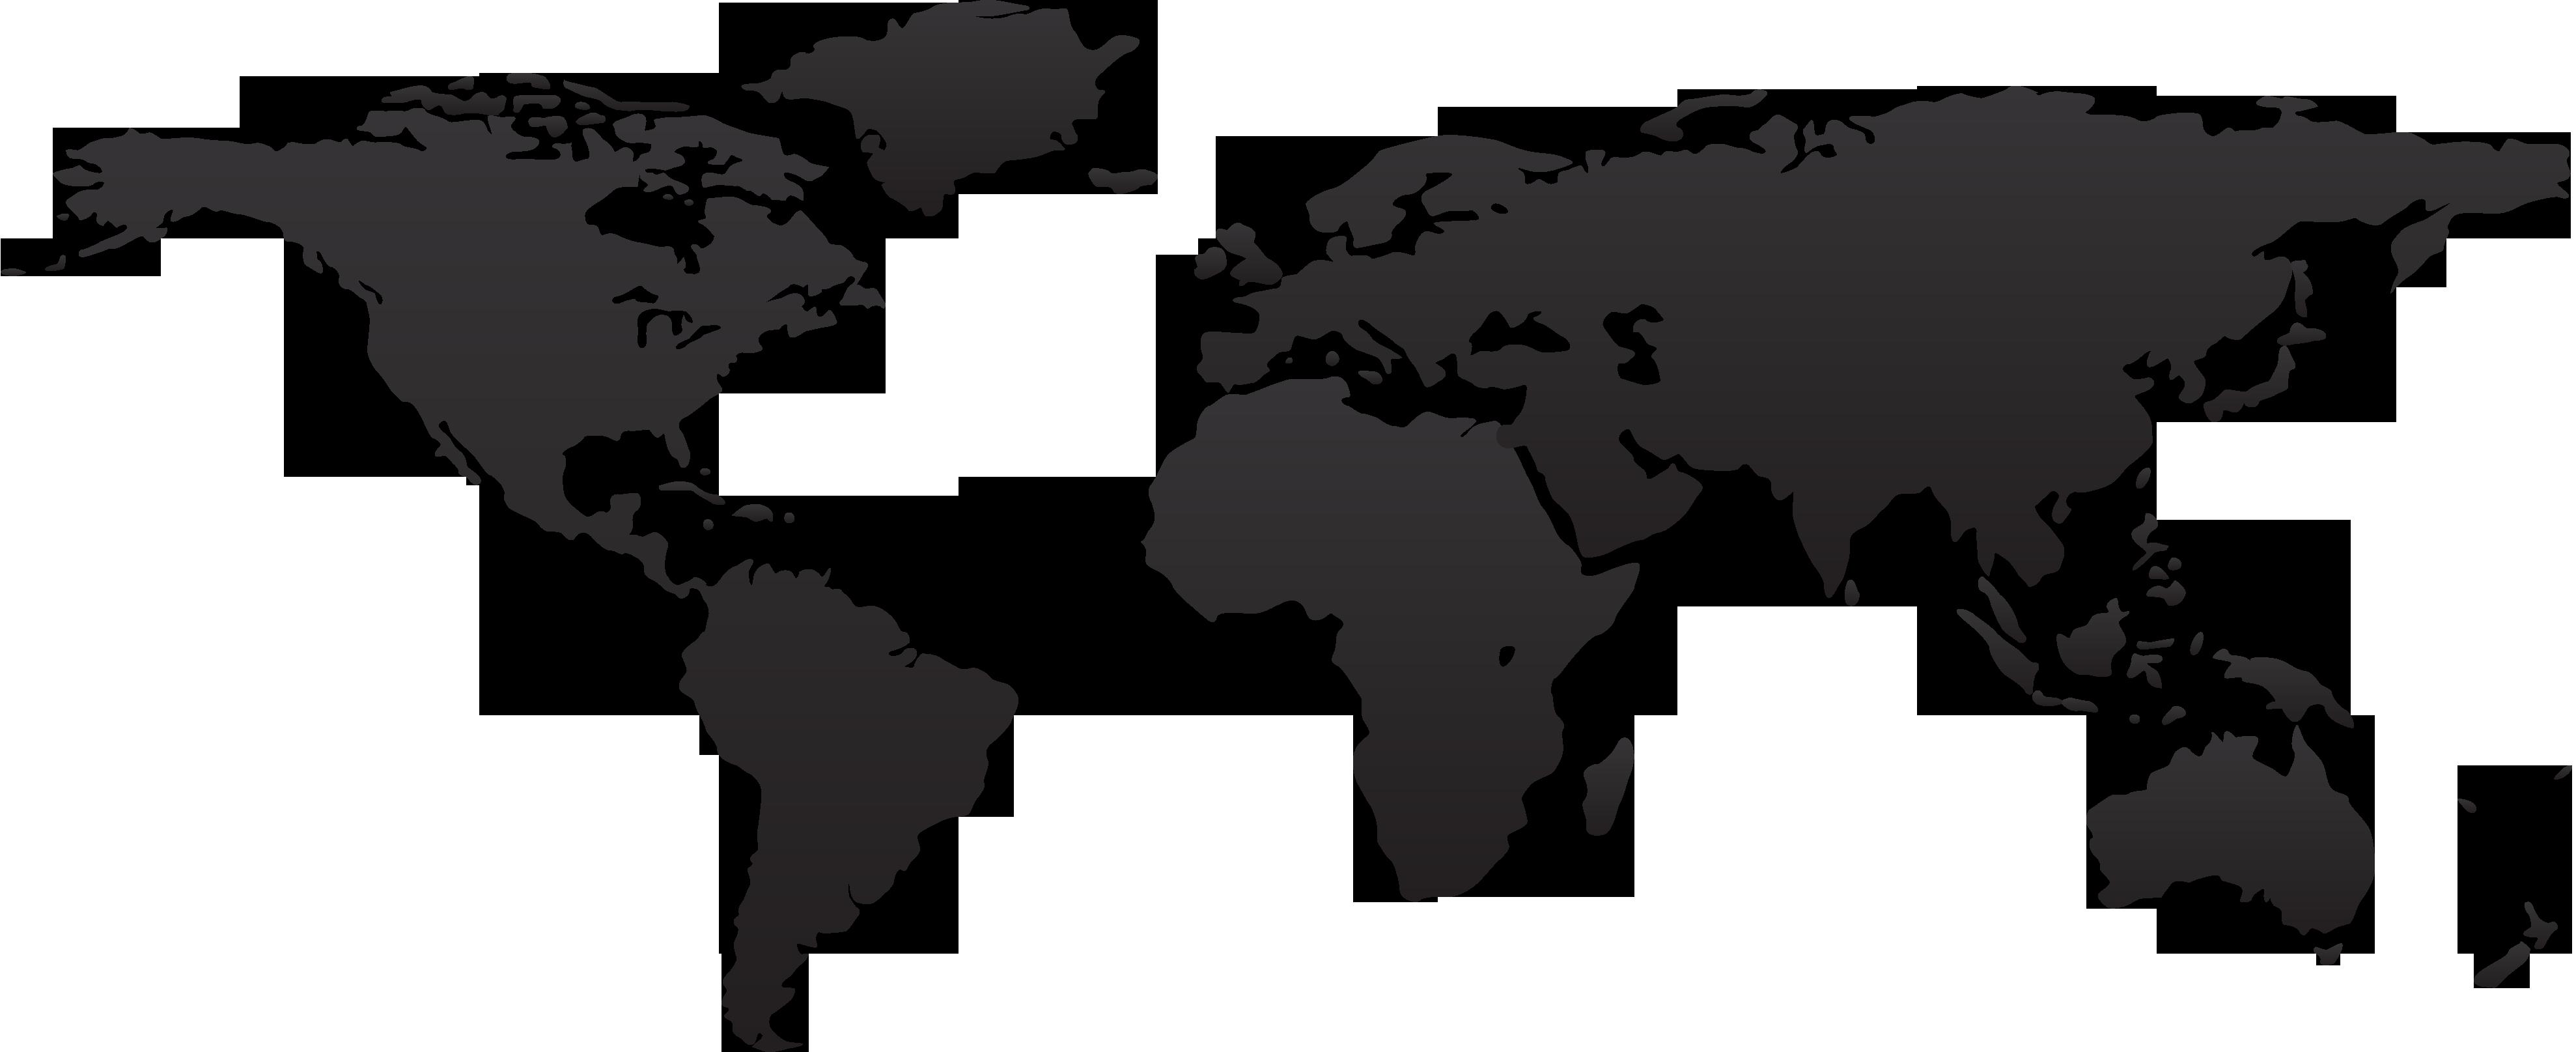 svg library download atlas vector flat world #109638314